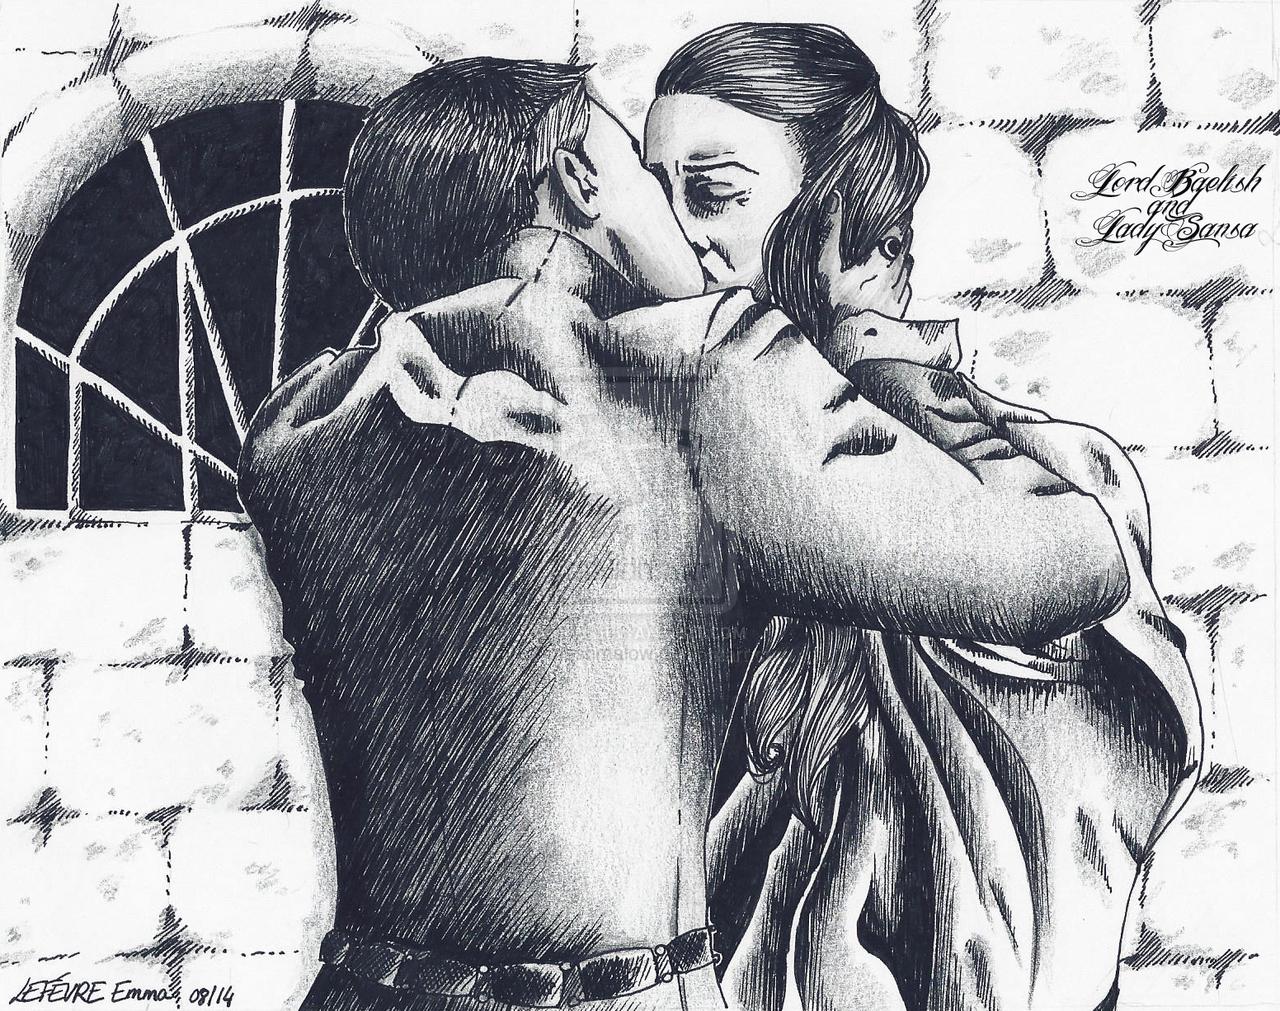 EC = Lord Baelish and Lady Sansa GOT 15.08.2014 fi by Emmashmalow.deviantart.com on @deviantART